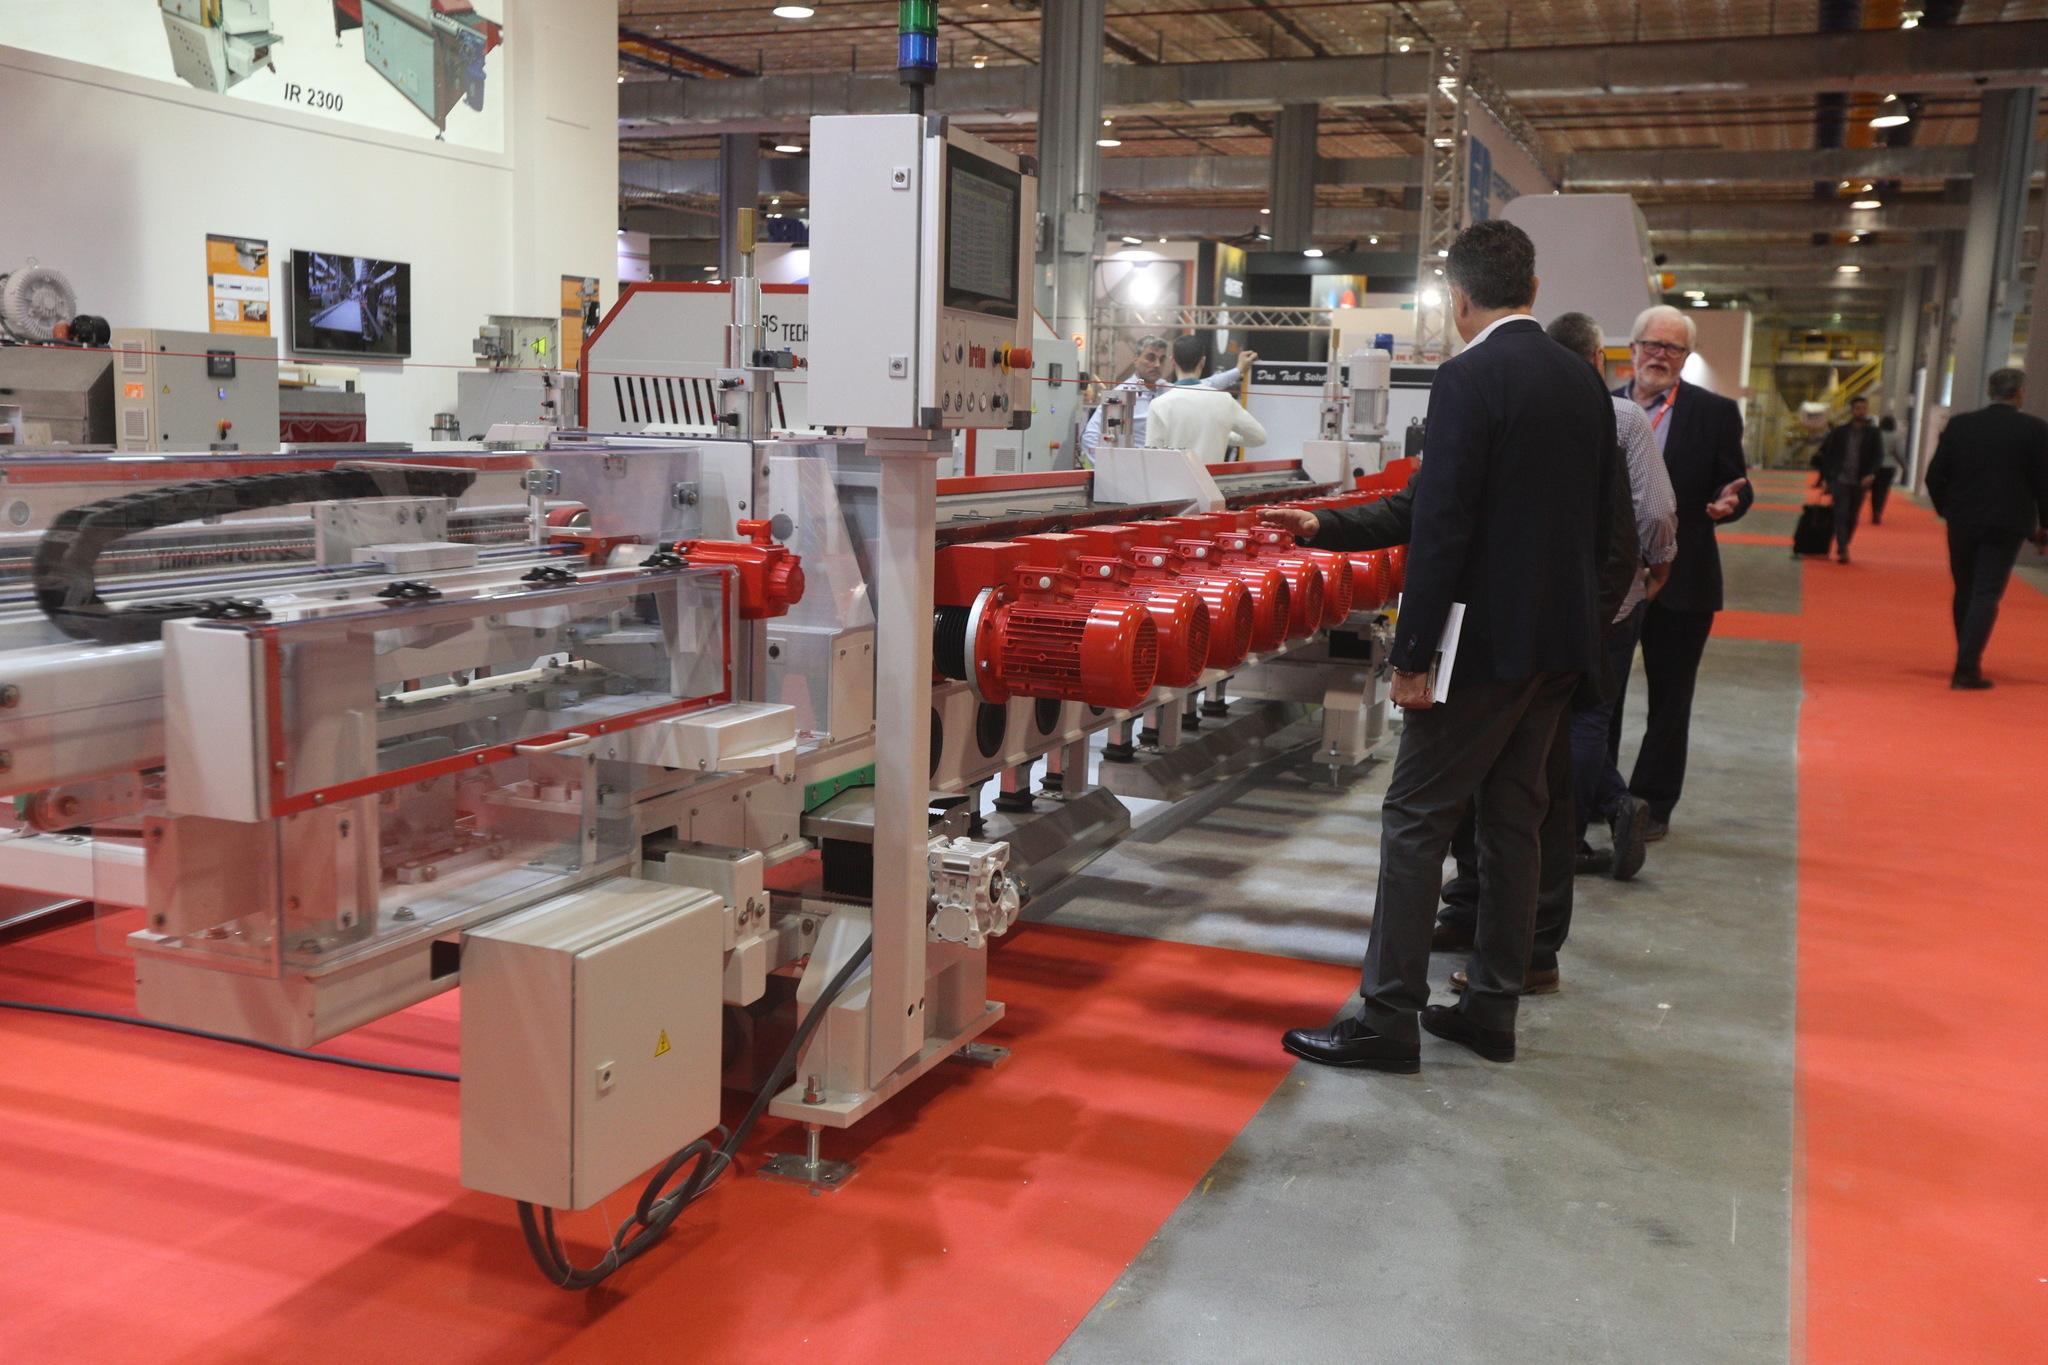 El sector de maquinaria cerámica mostró sus novedades en la última feria antes de la Covid, es decir, enCevisama 2020 .